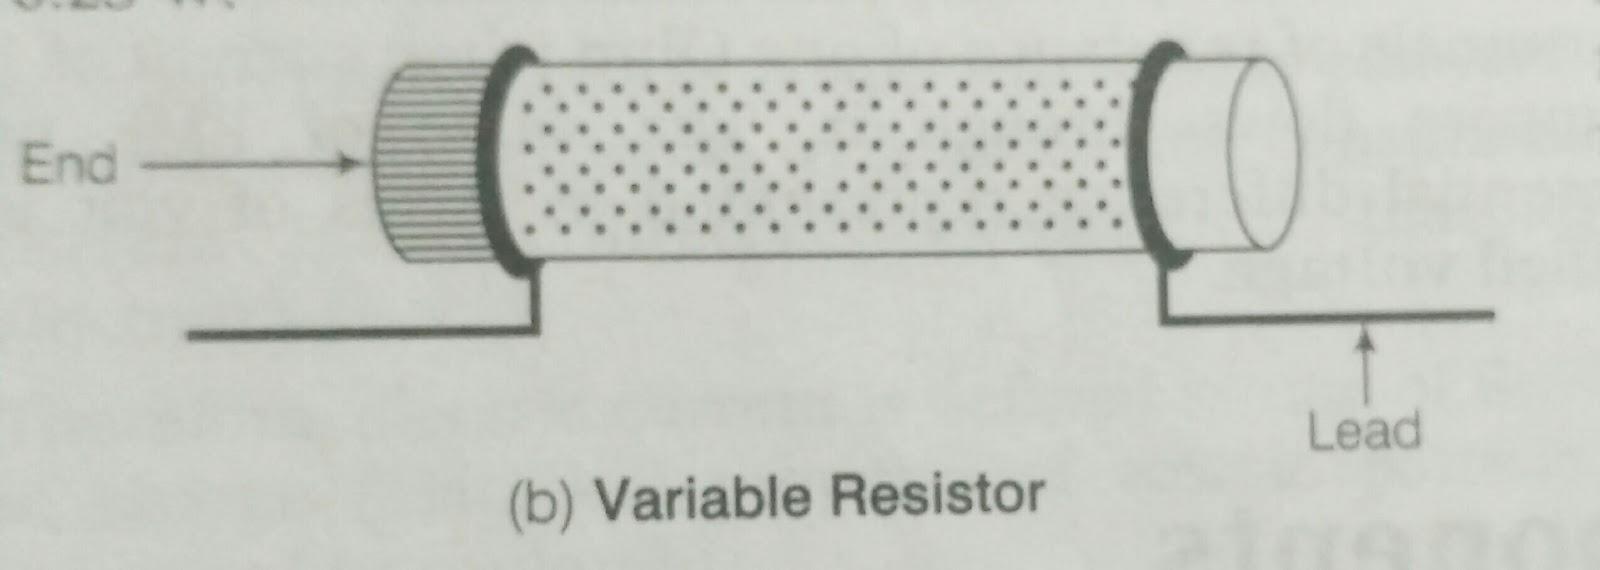 image of variable resistor